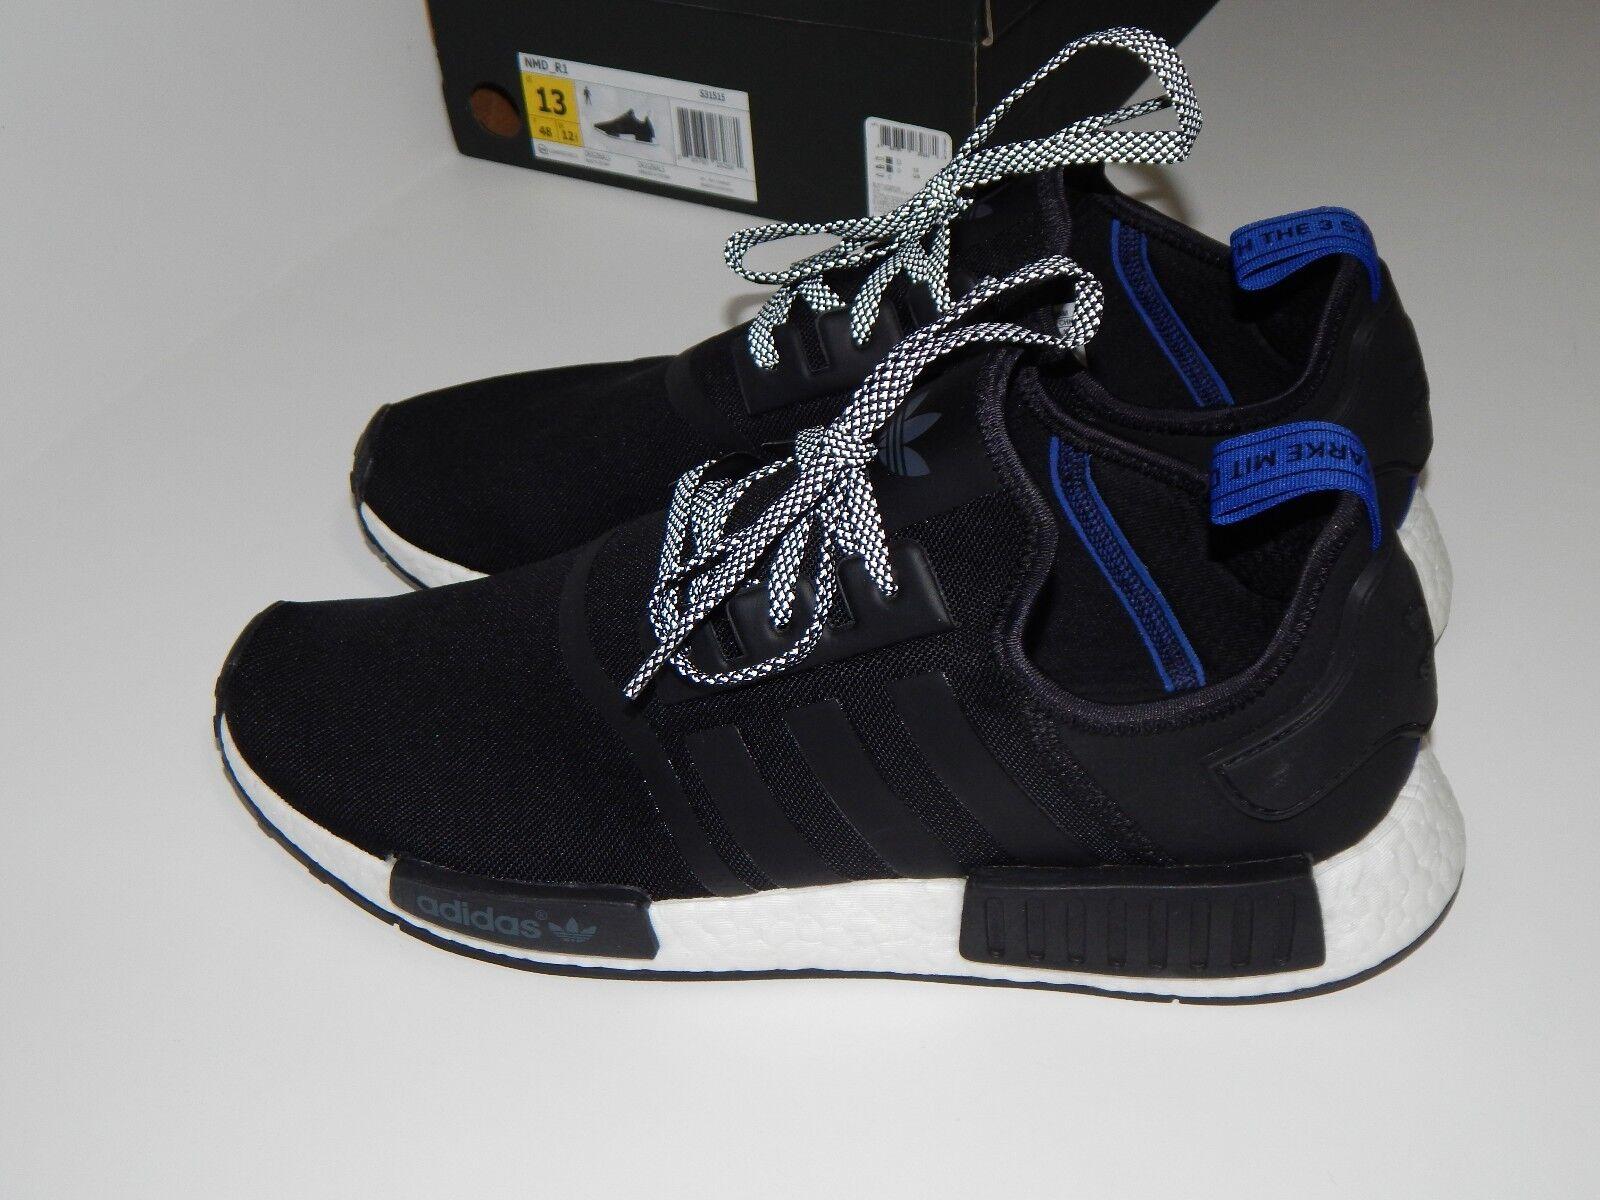 Adidas Men's Casual Shoes 13 GU Blue Tab Black NMD_R1 BOOST VNDS BO MAO w/Box